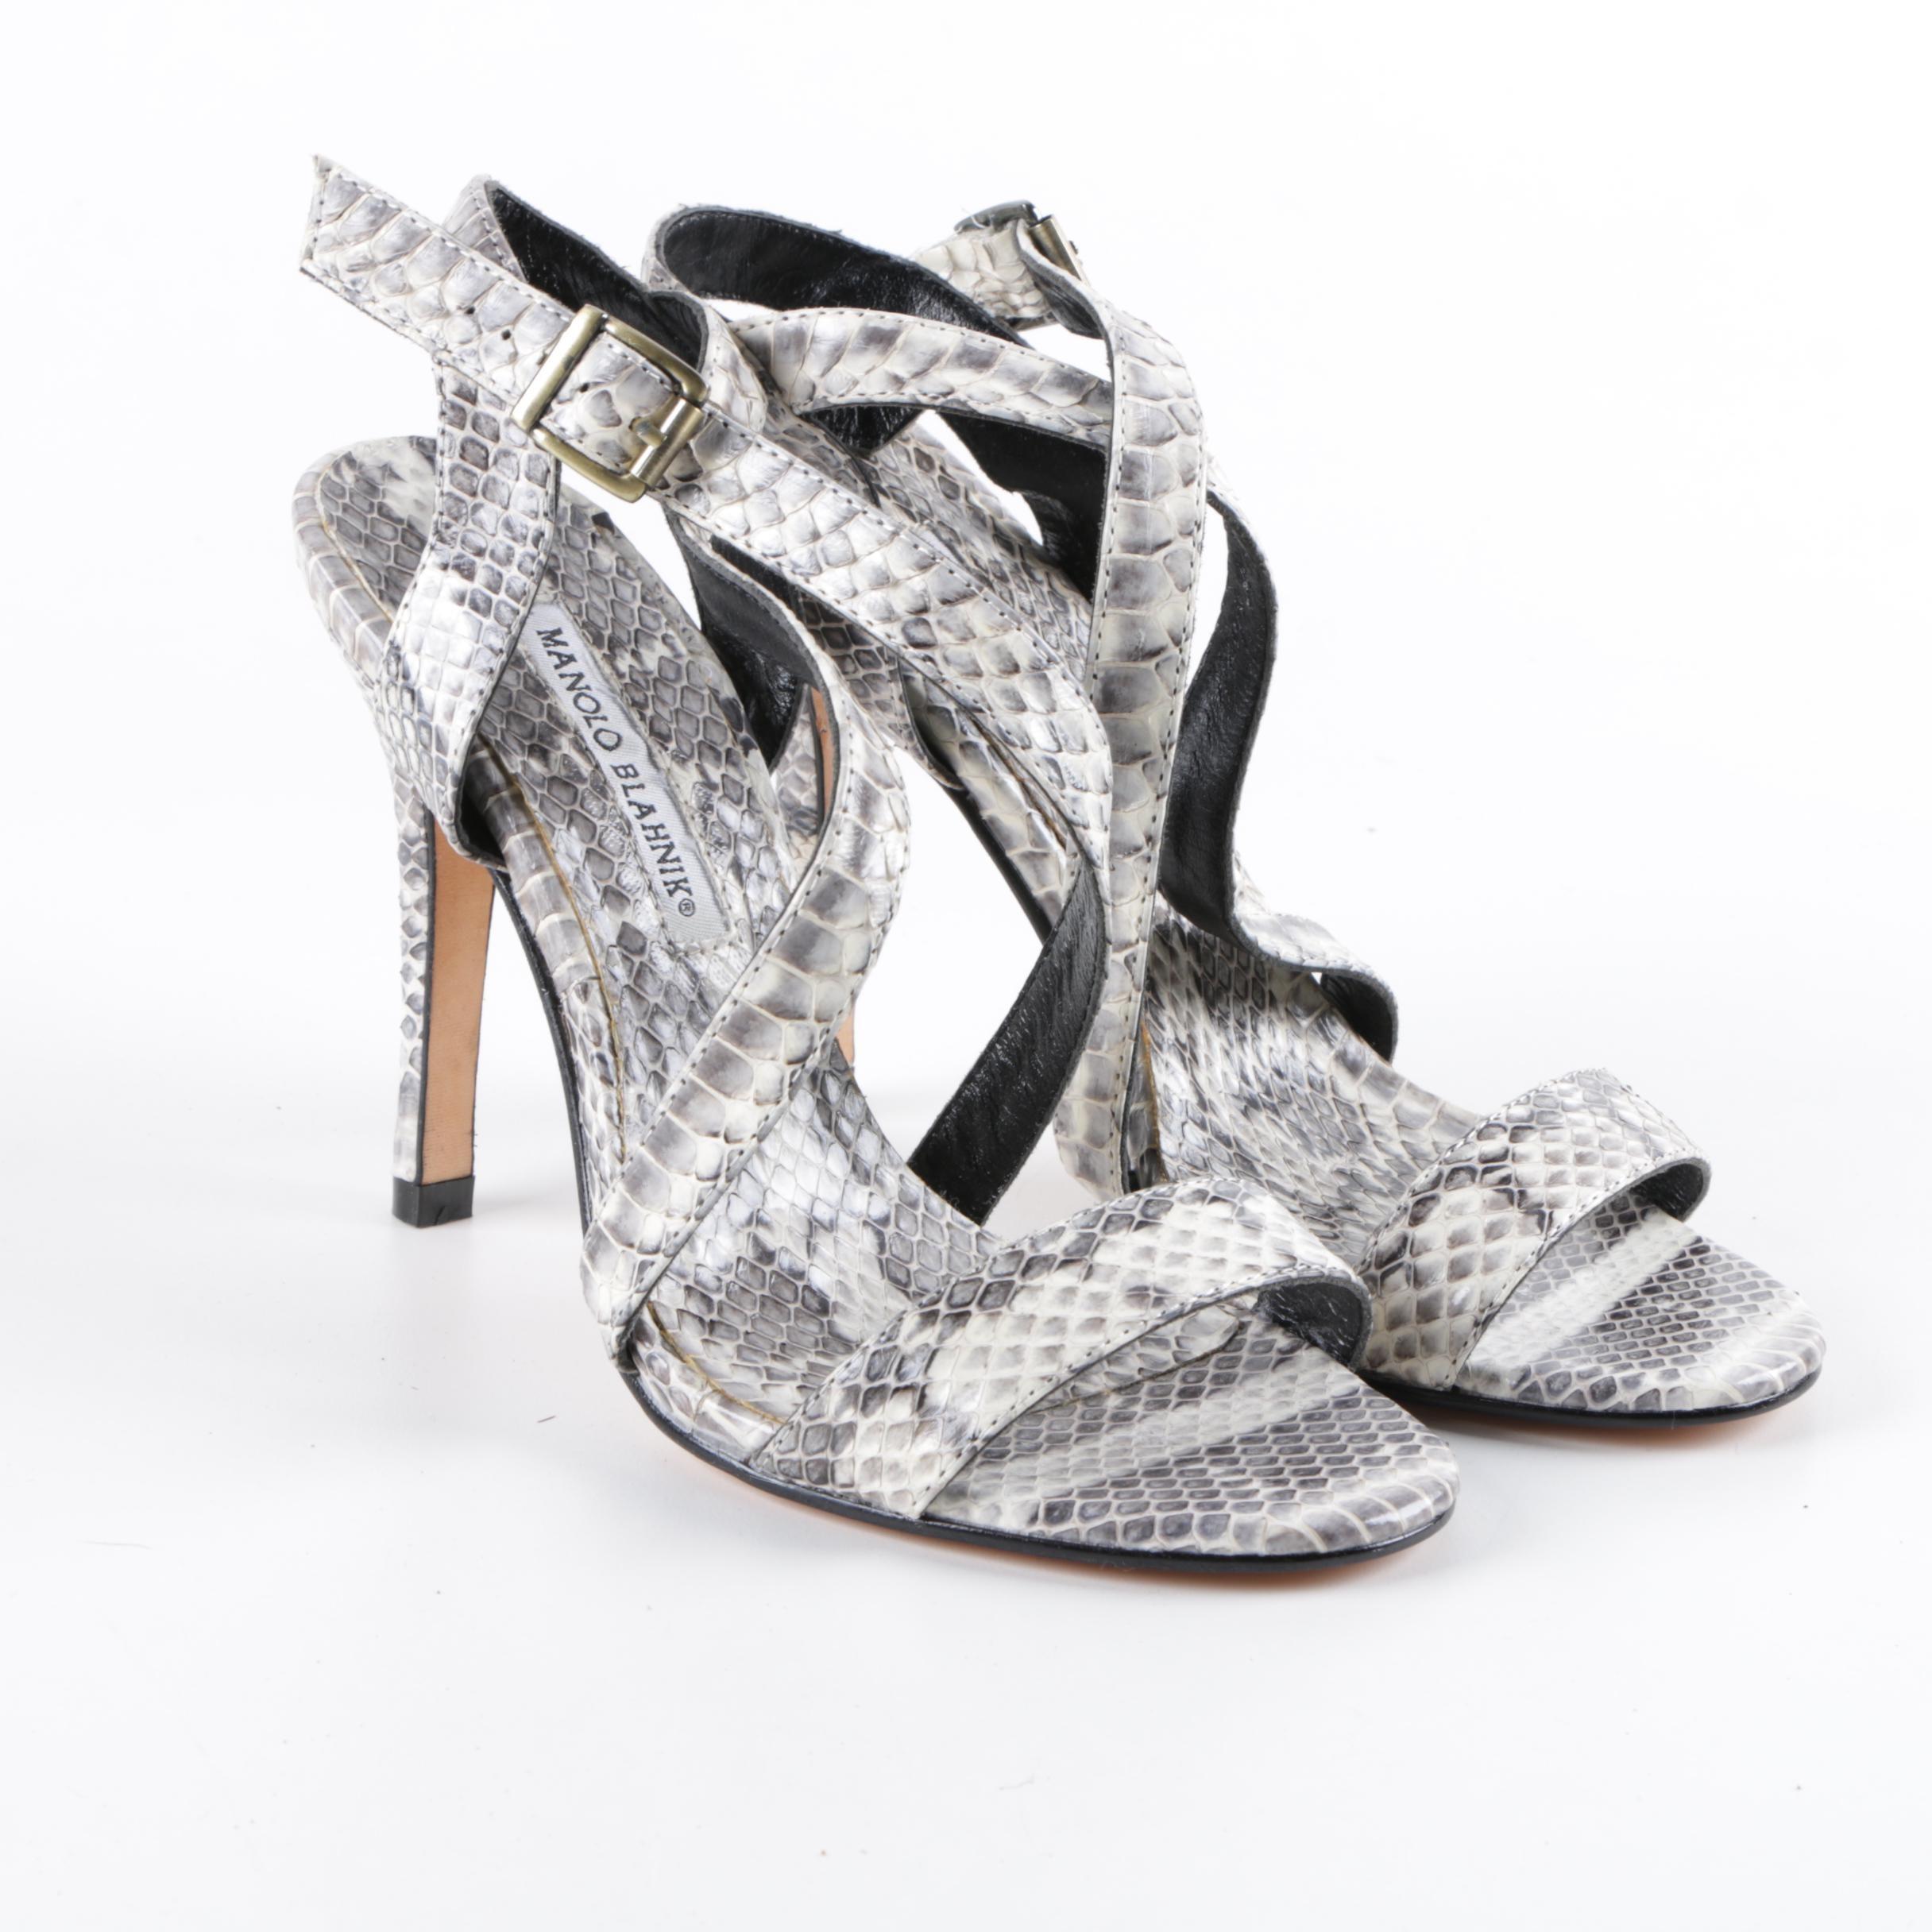 Manolo Blahnik Python Skin Cross Strap Heels